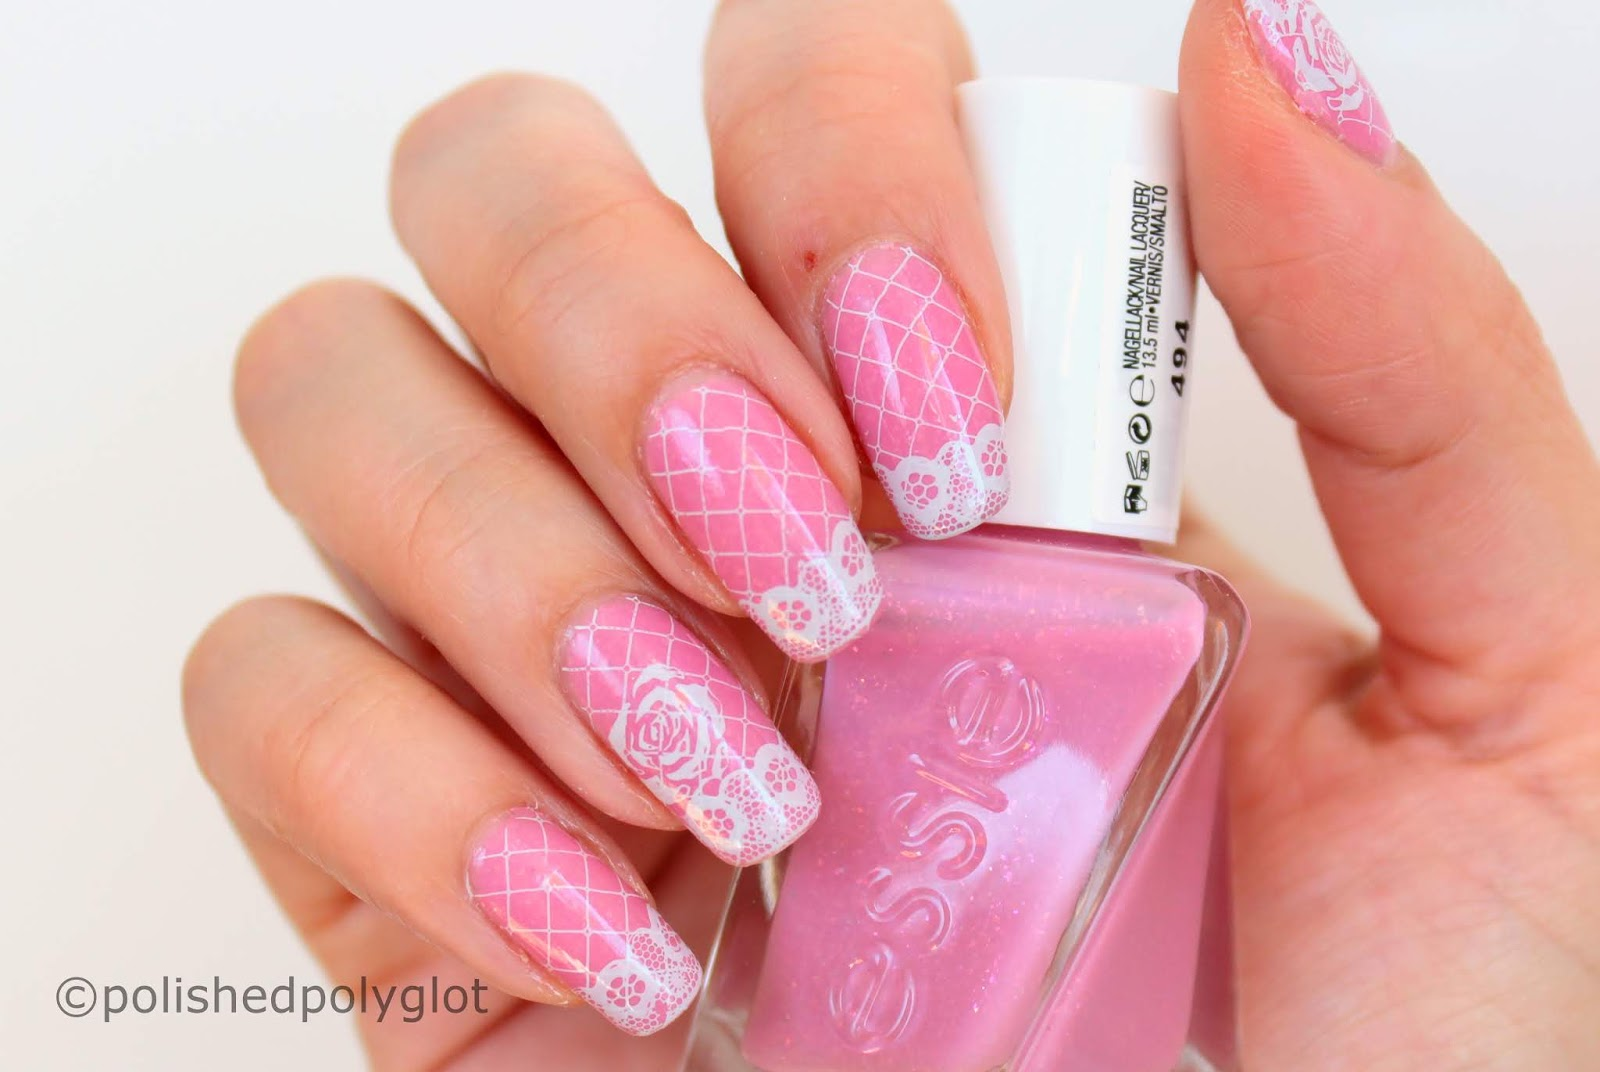 Nail Art  Pink and Lace Wedding manicure [26 Great Nail ...